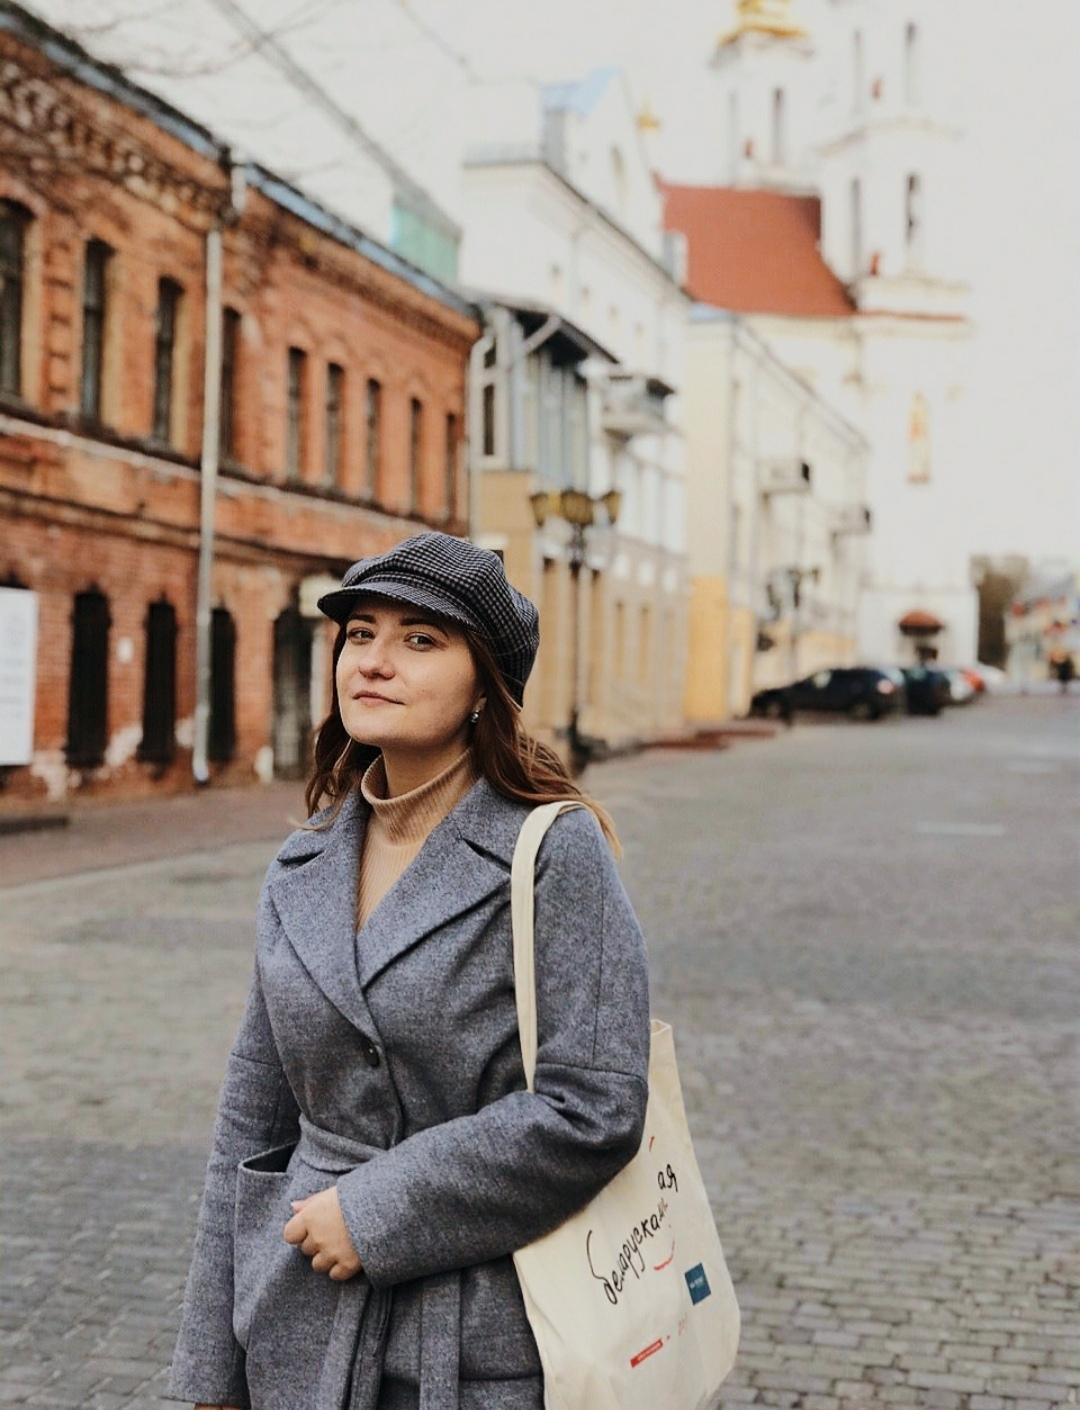 dZVxJh9pWr0 - Вероника Островская